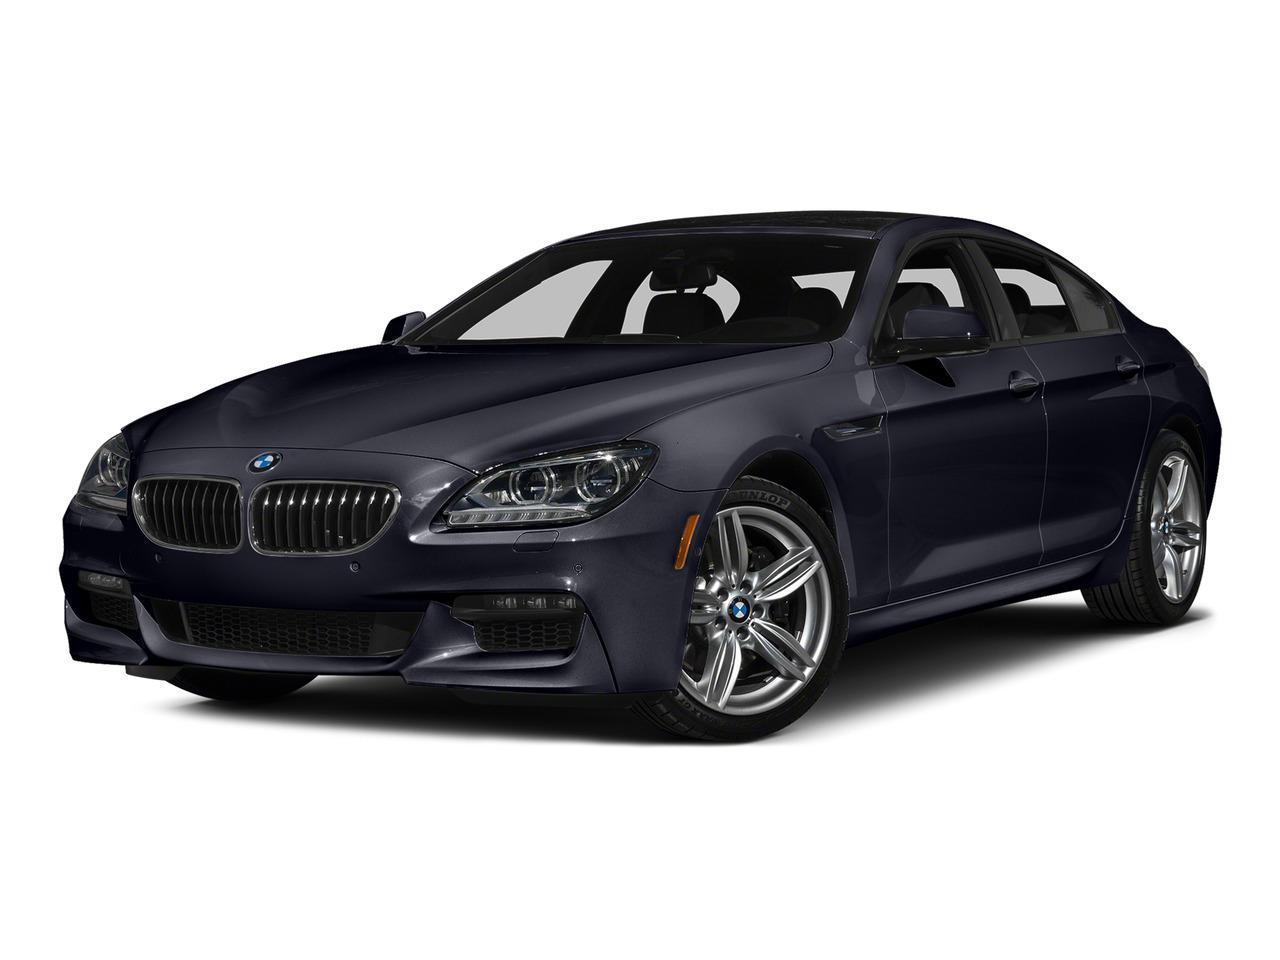 2015 BMW 640i Vehicle Photo in Pleasanton, CA 94588